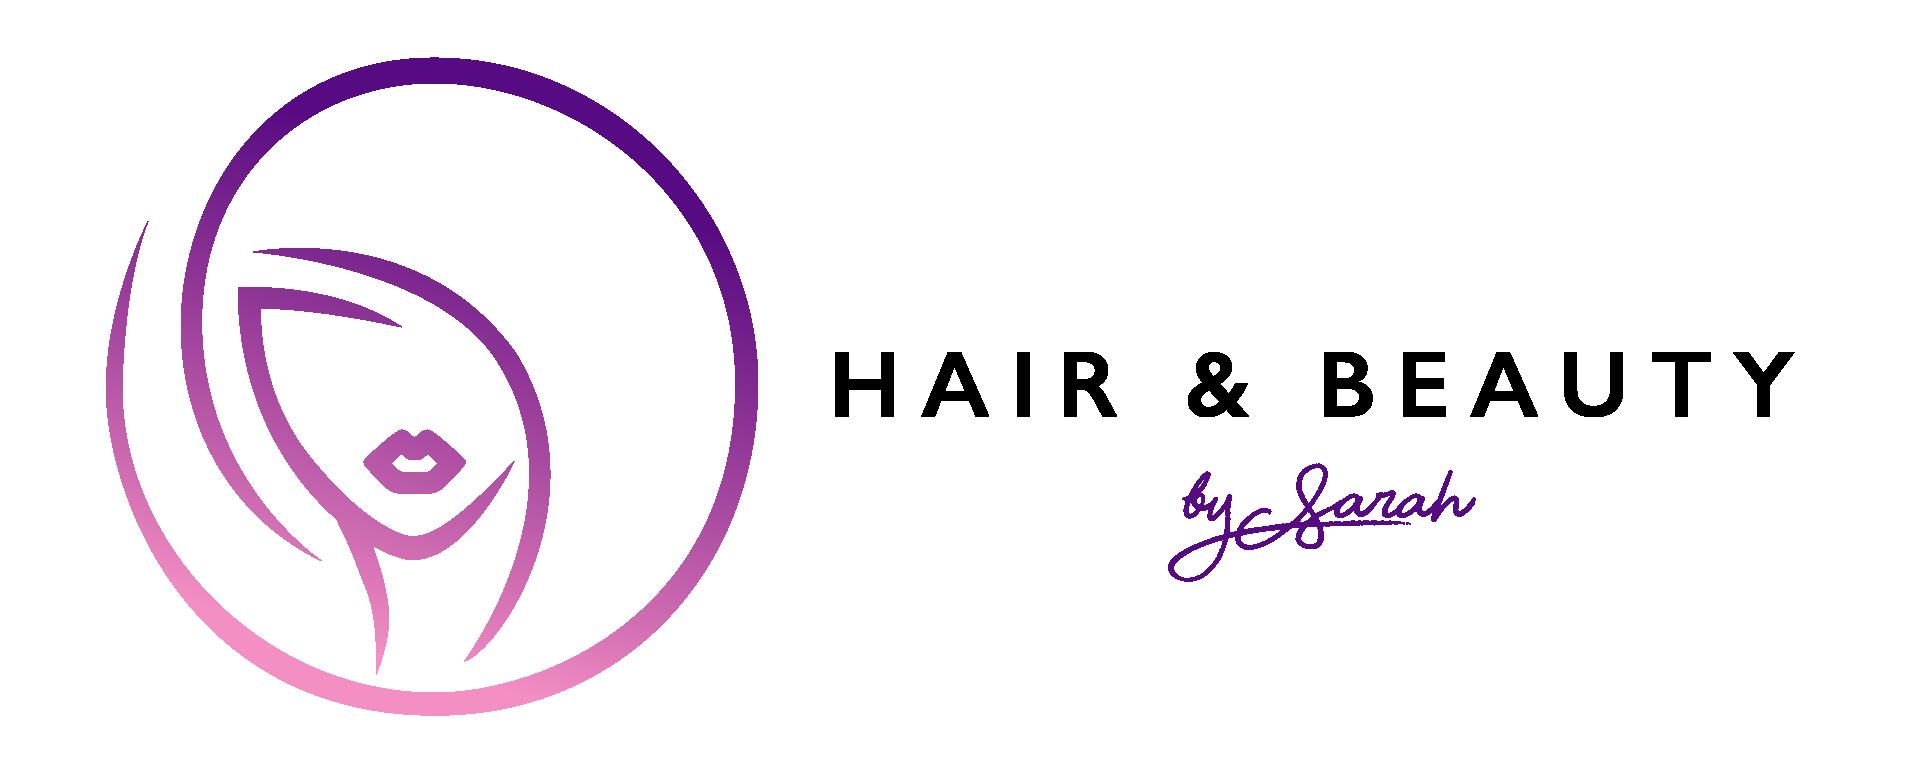 Hairbysarah_Logo_Strip_Logo Strip.png